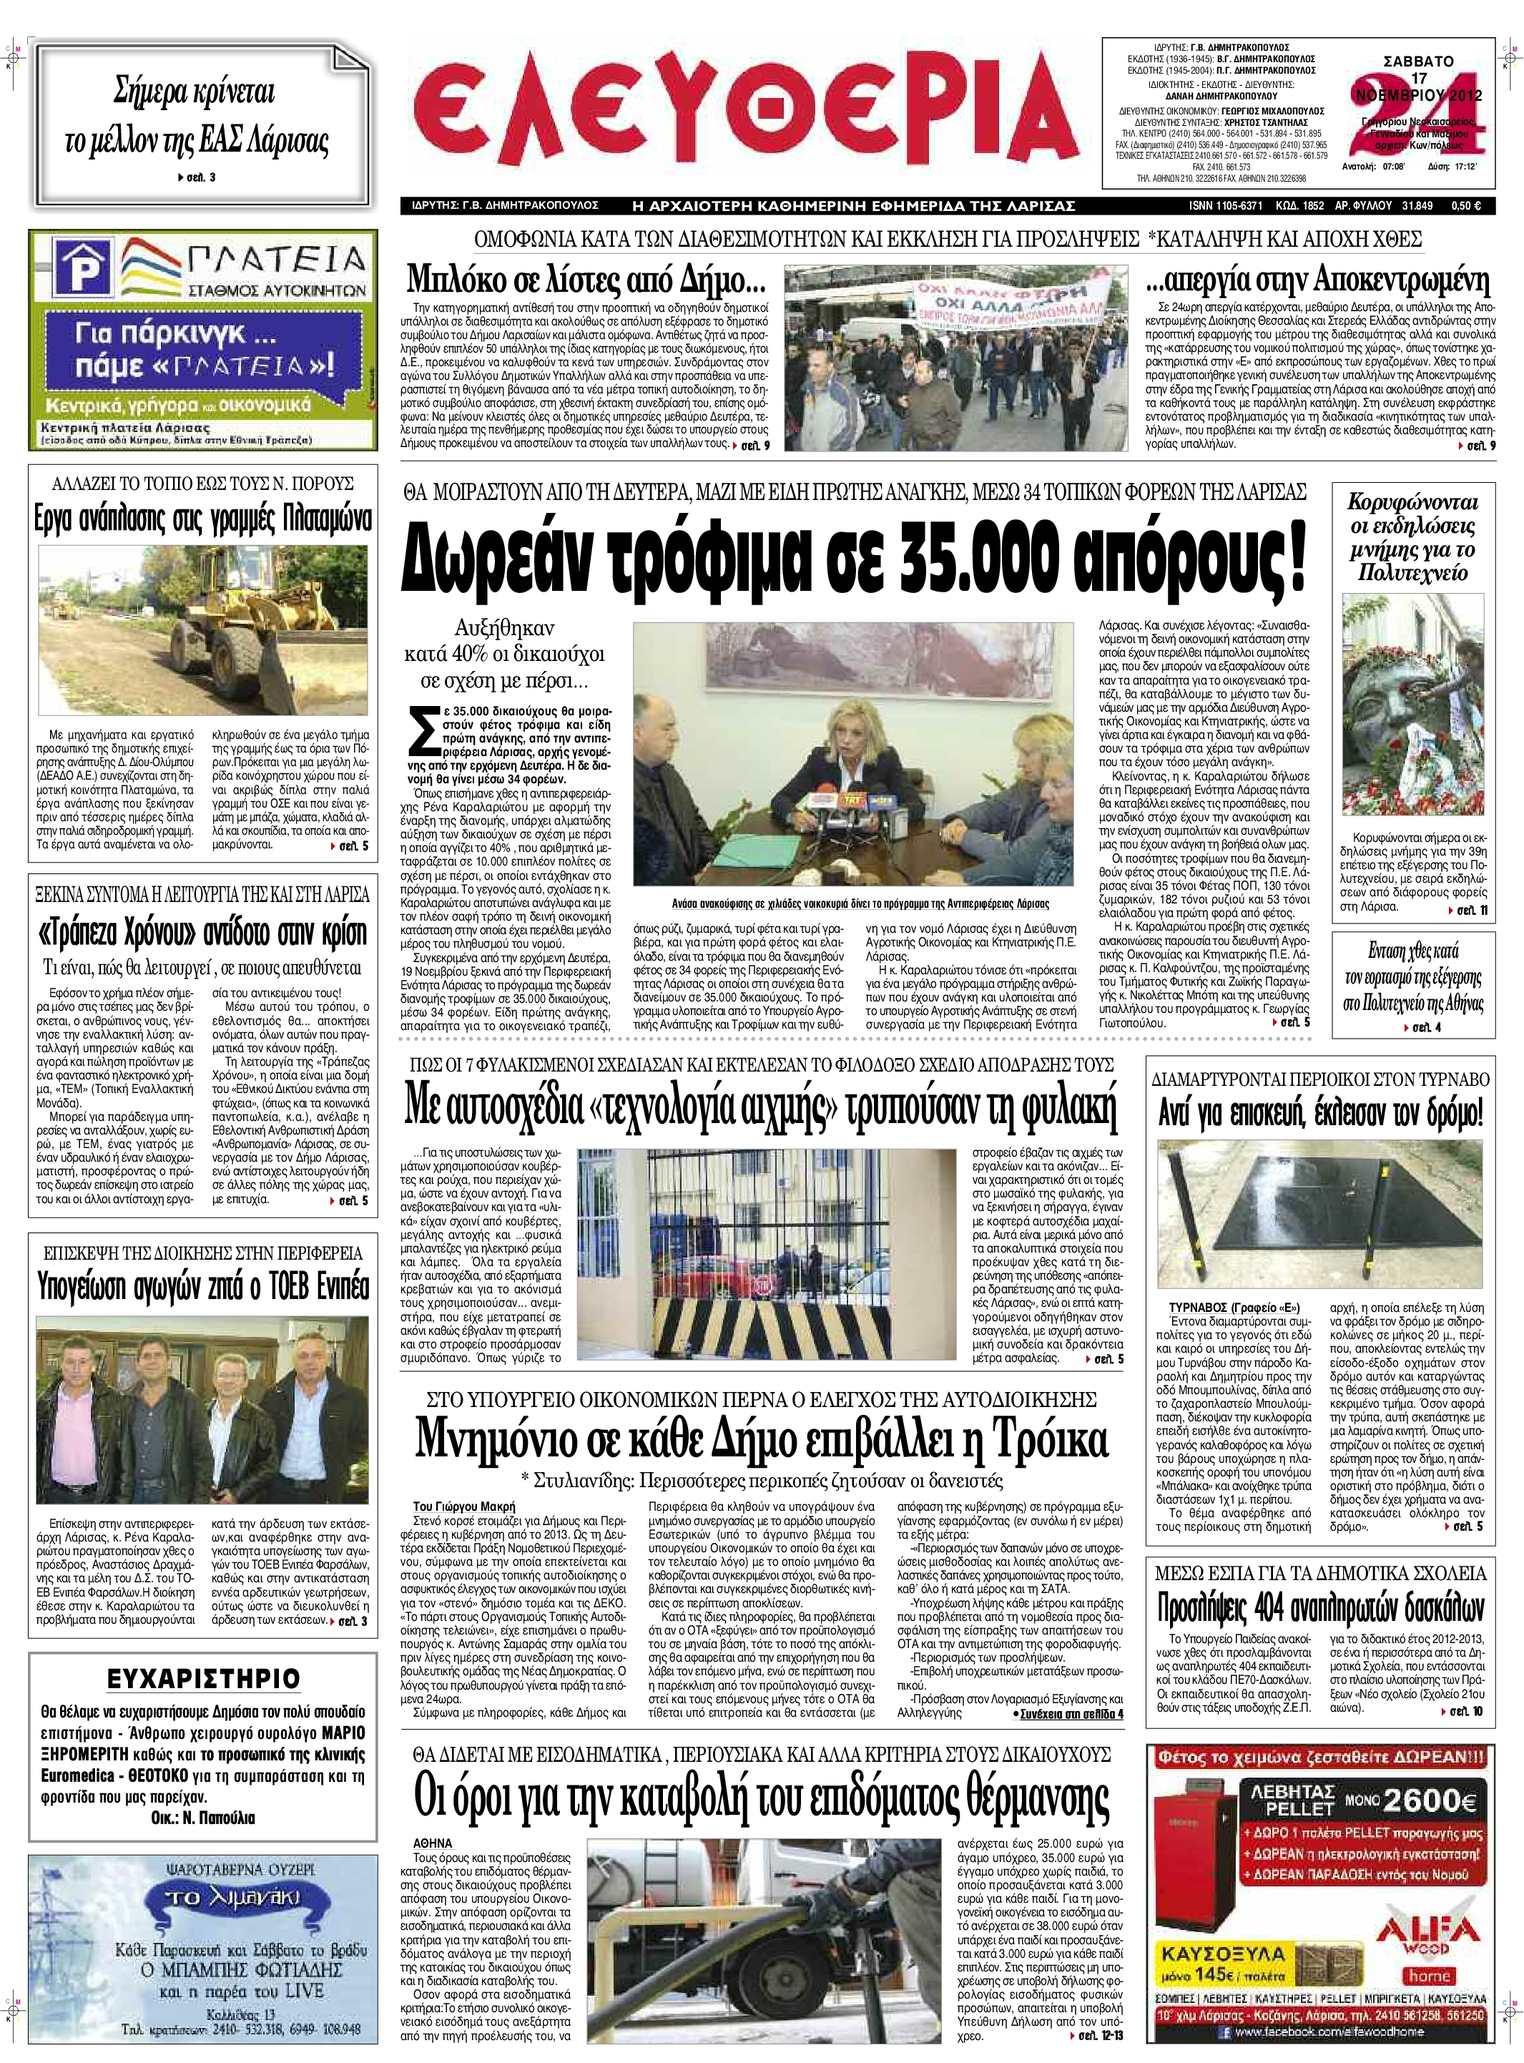 Calaméo - Eleftheria.gr 17 10 2012 581f2c20fdc